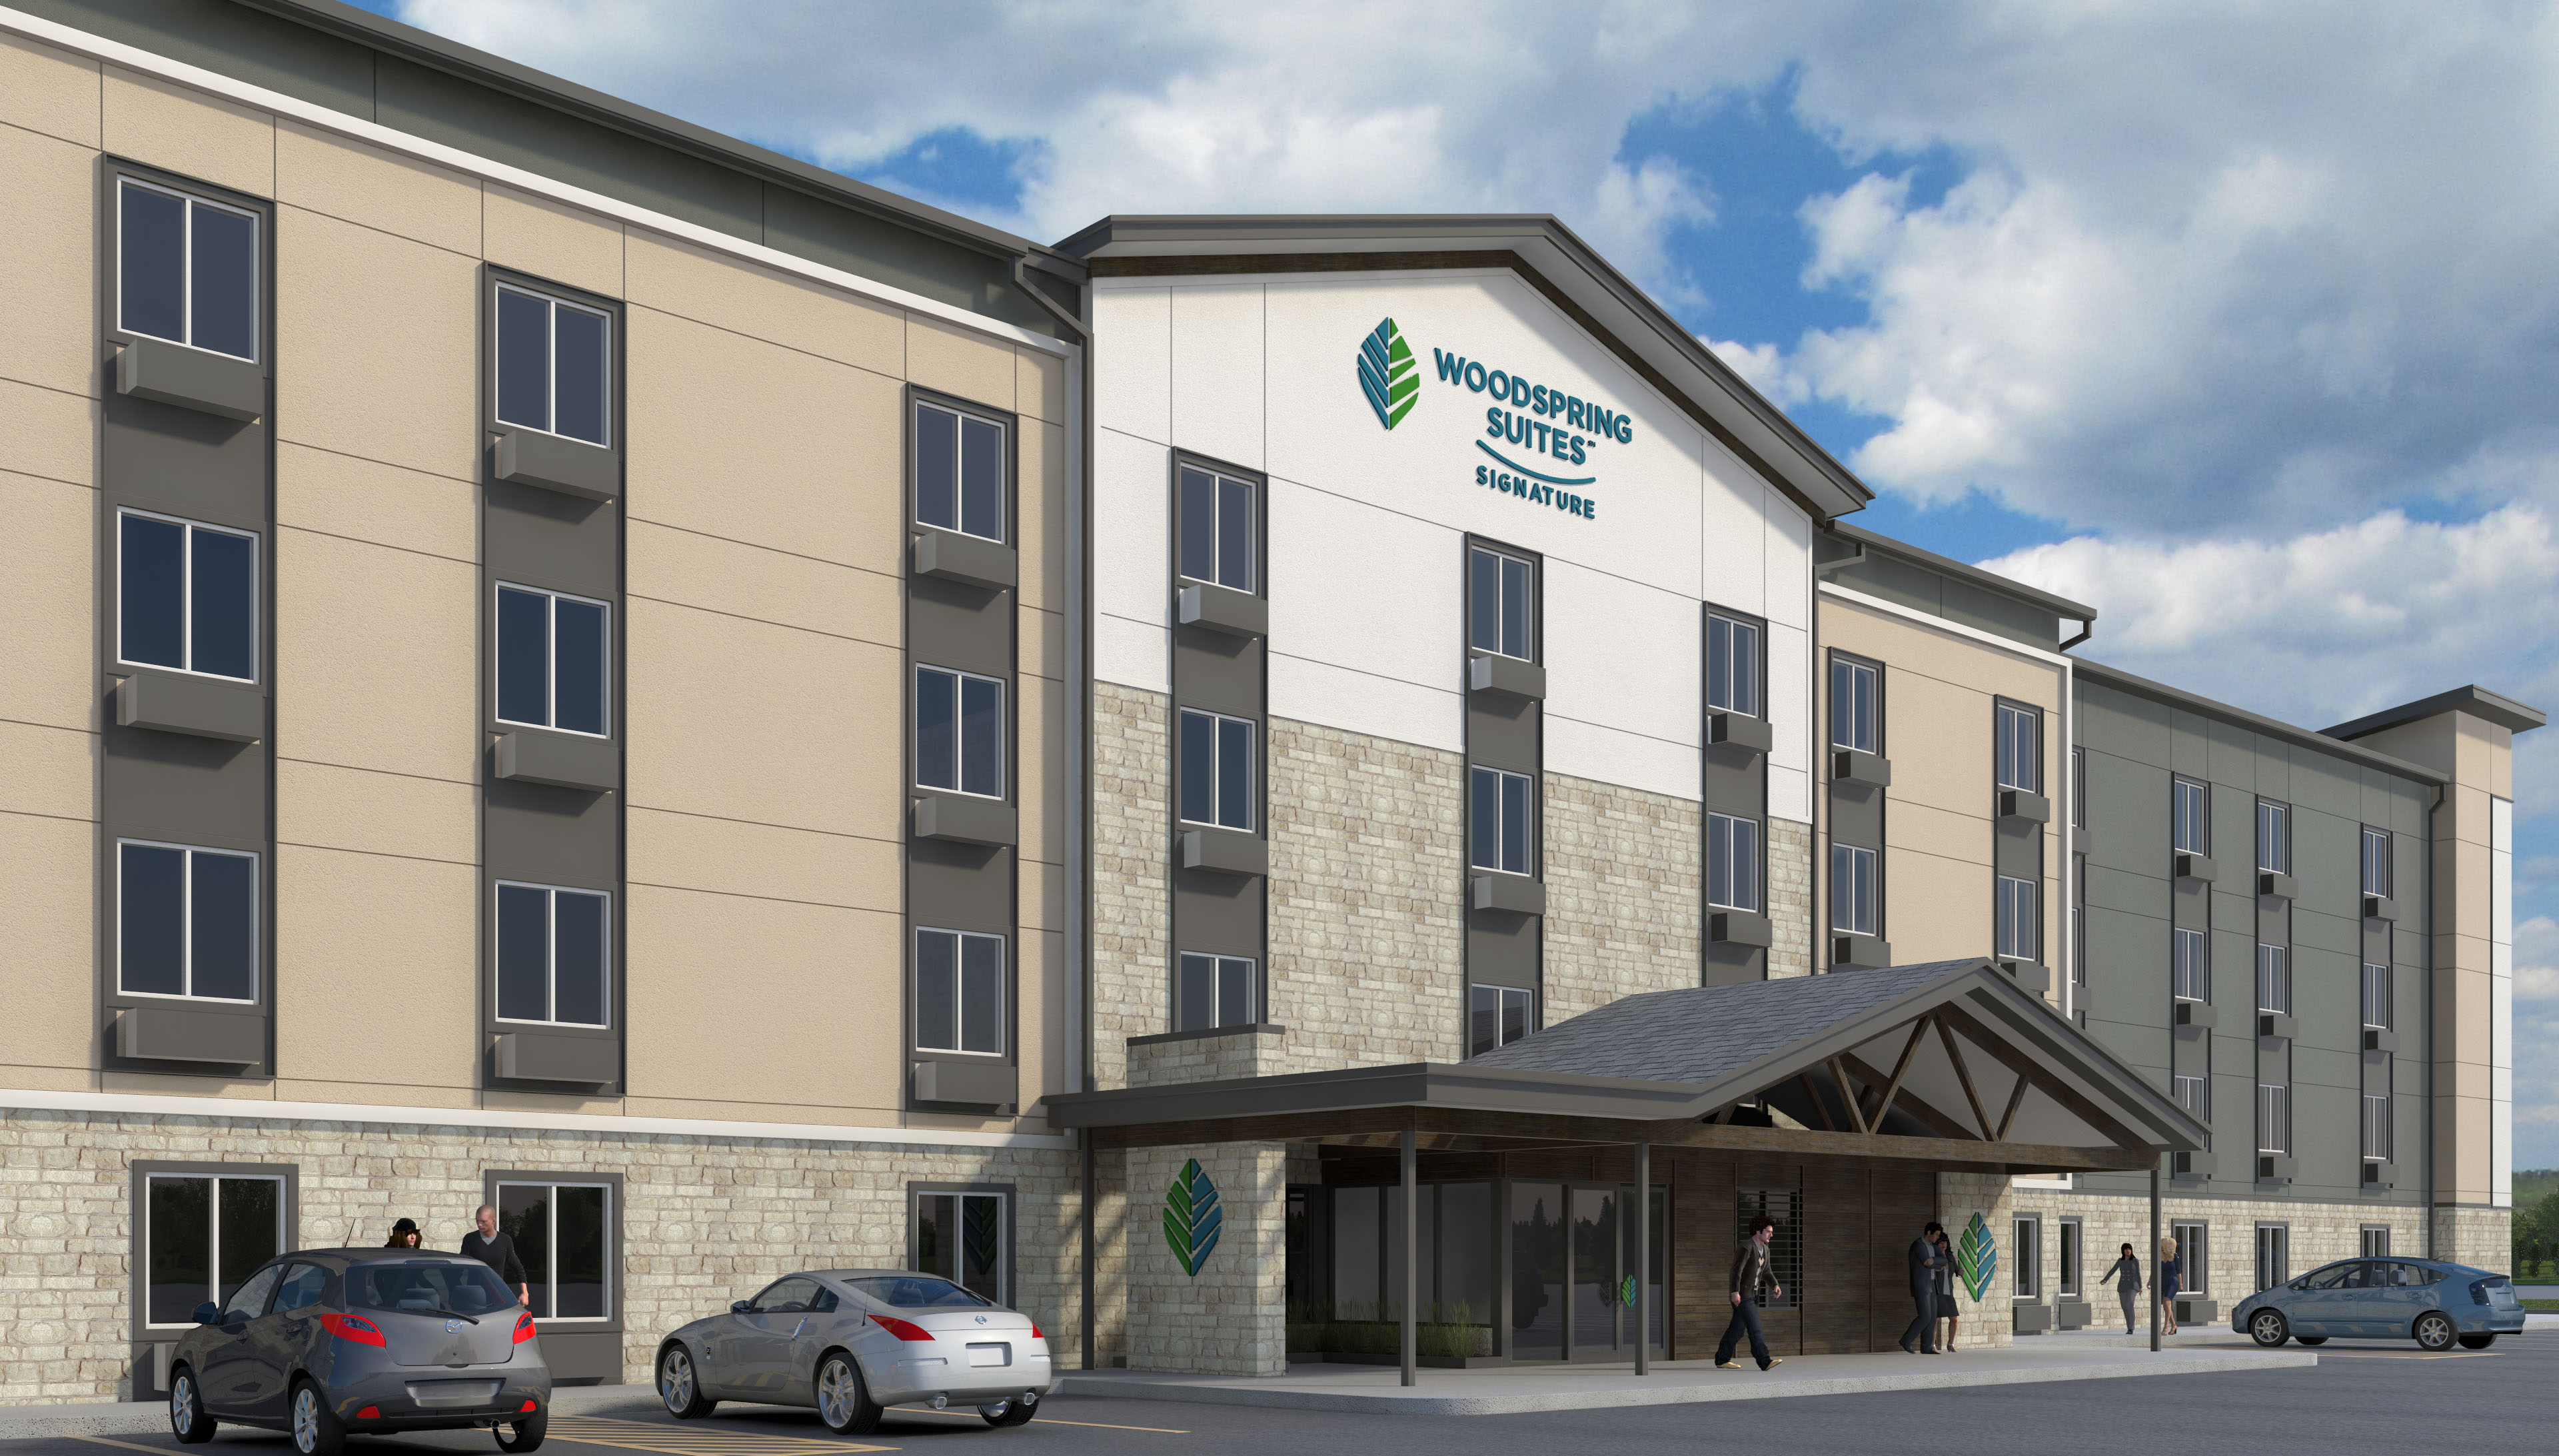 Woodspring Hotelssm Launches Suites Signature Prototype